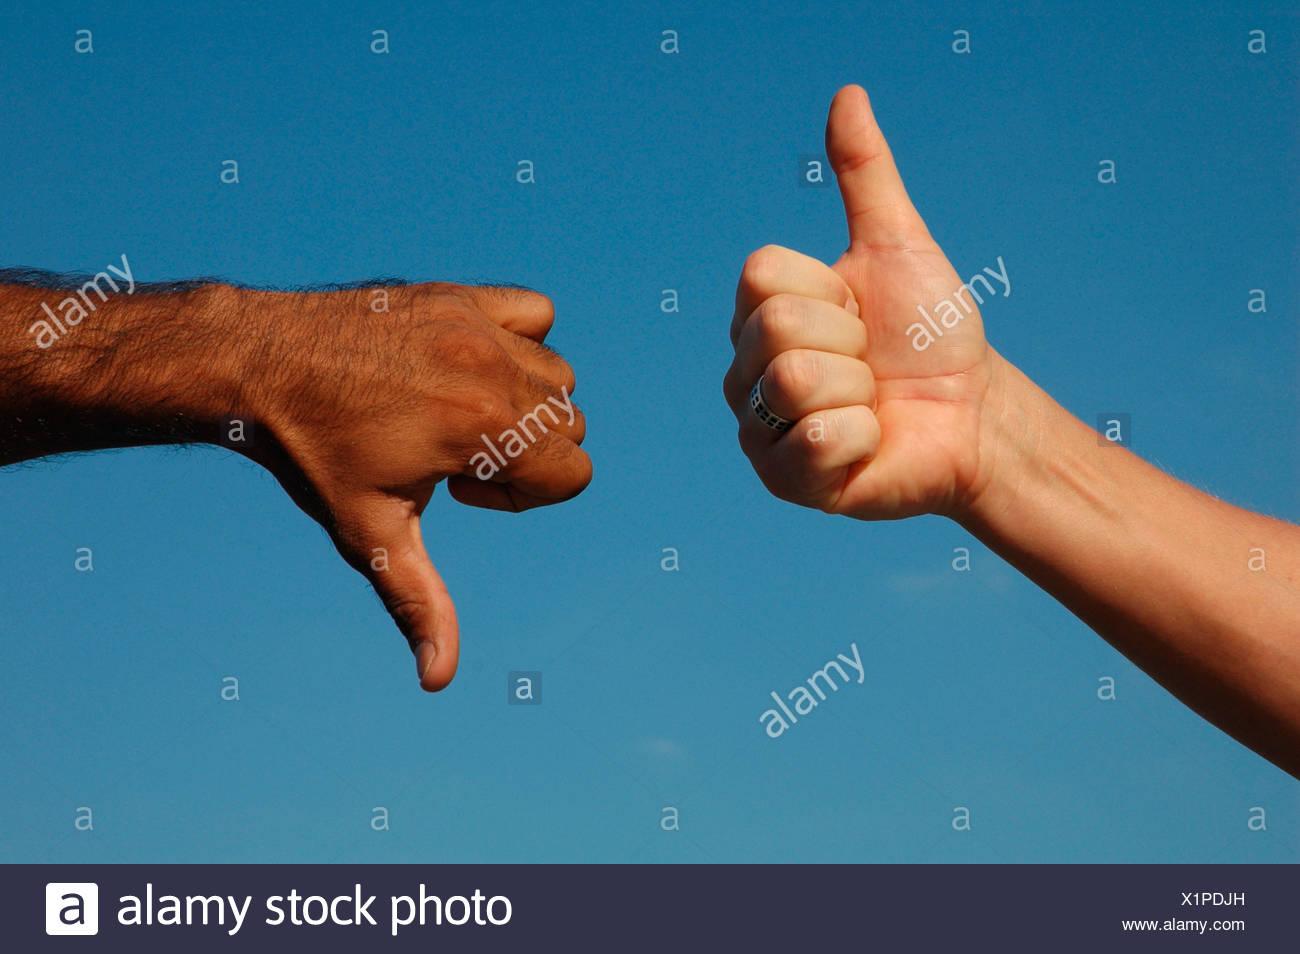 MR thumb up thumb down Stock Photo